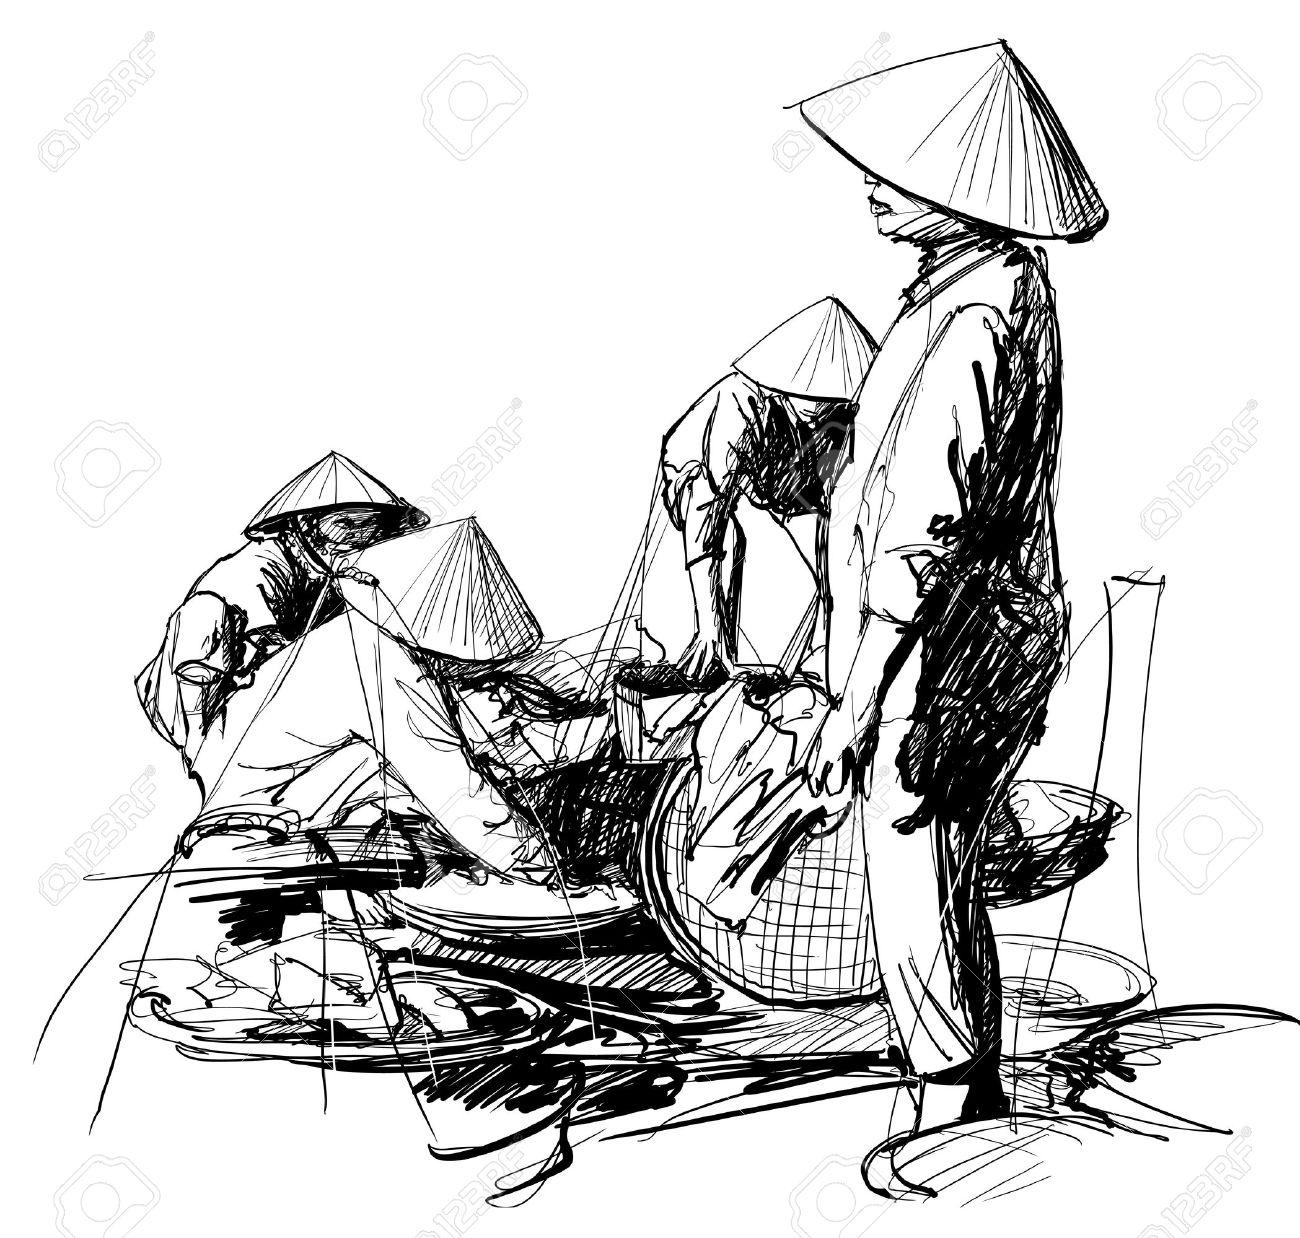 Vector illustration of a market scenery in Vietnam Stock Vector - 16394126